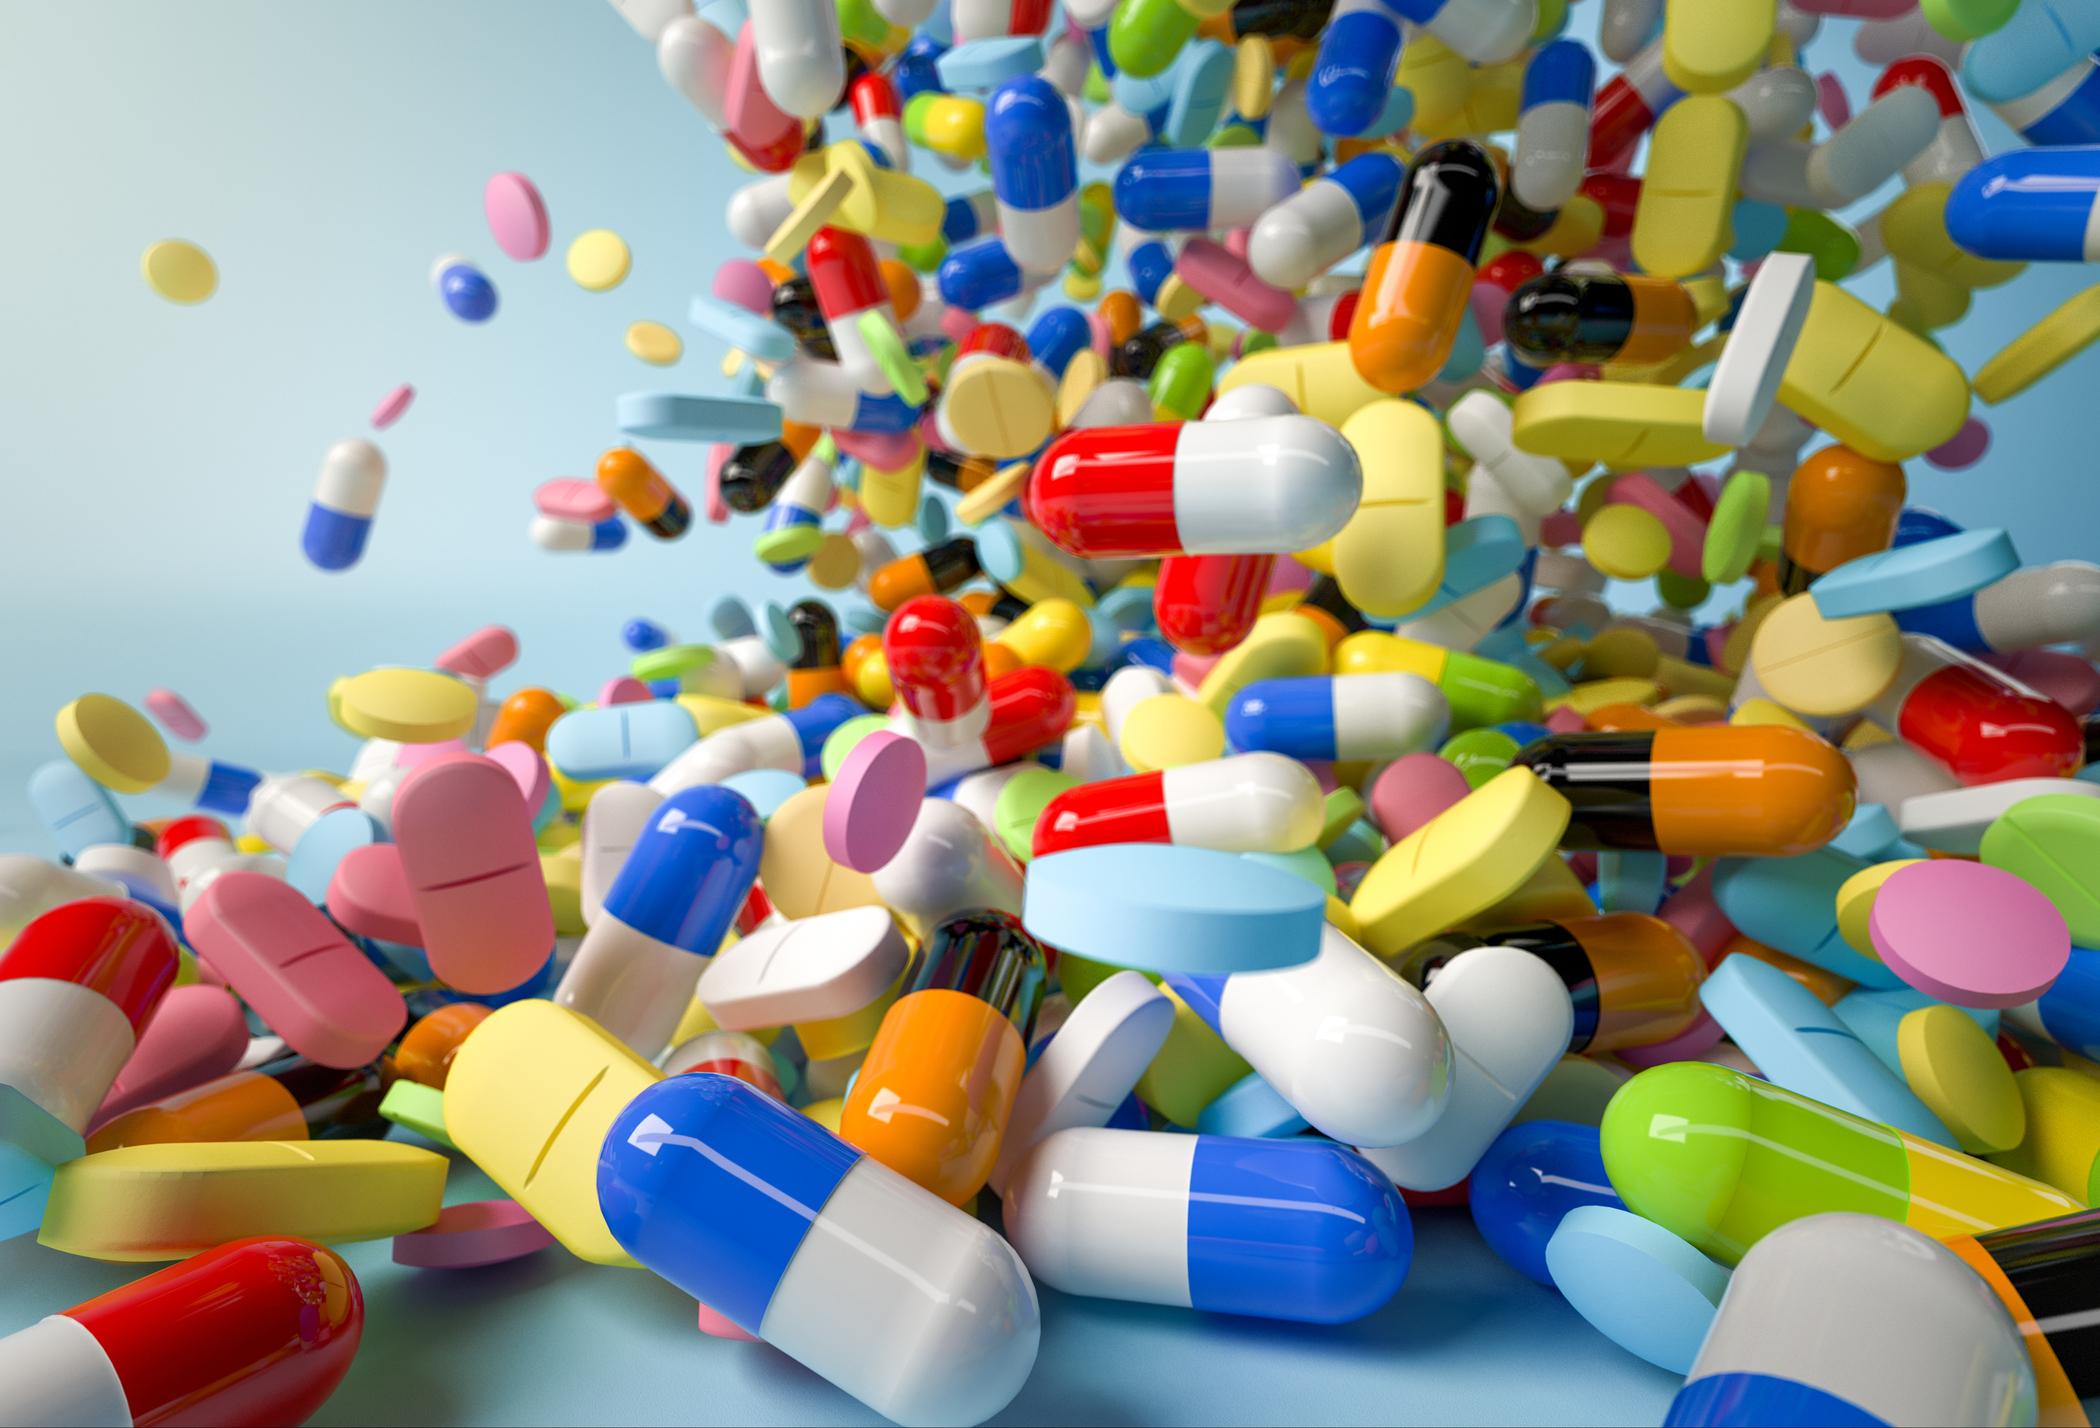 Falling prescription drugs pills and capsules